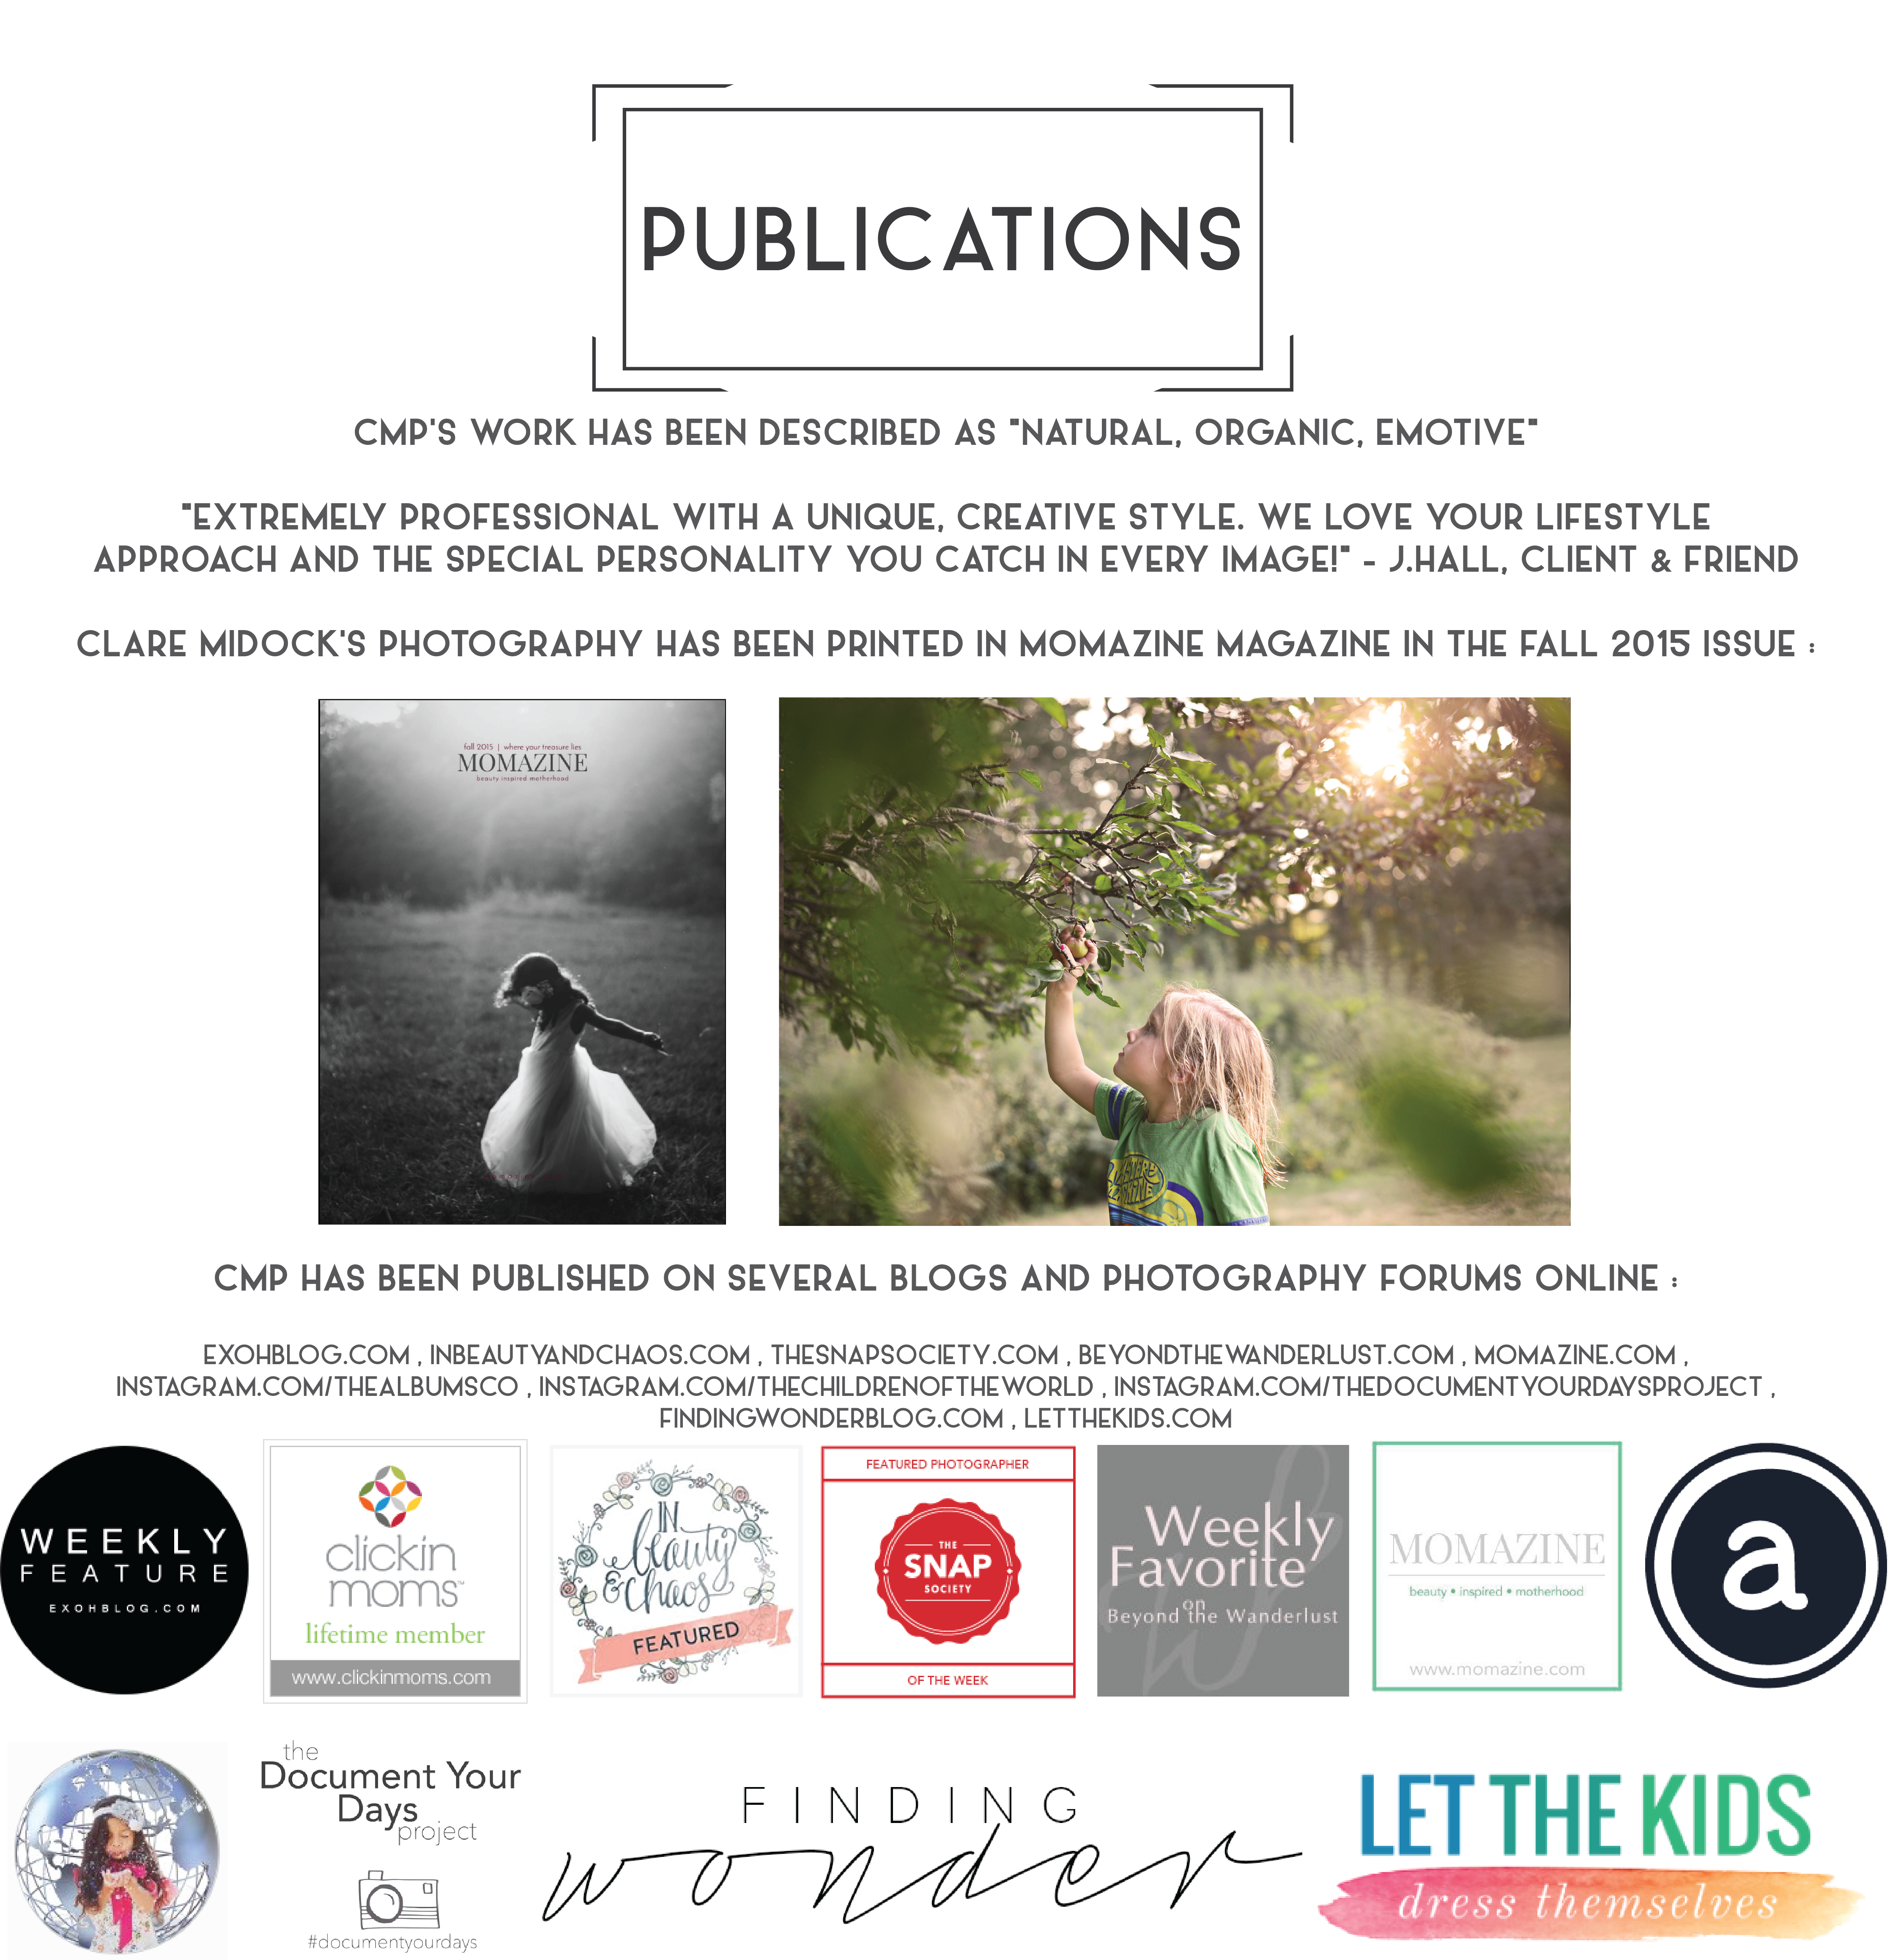 PUBLICATIONS (1)